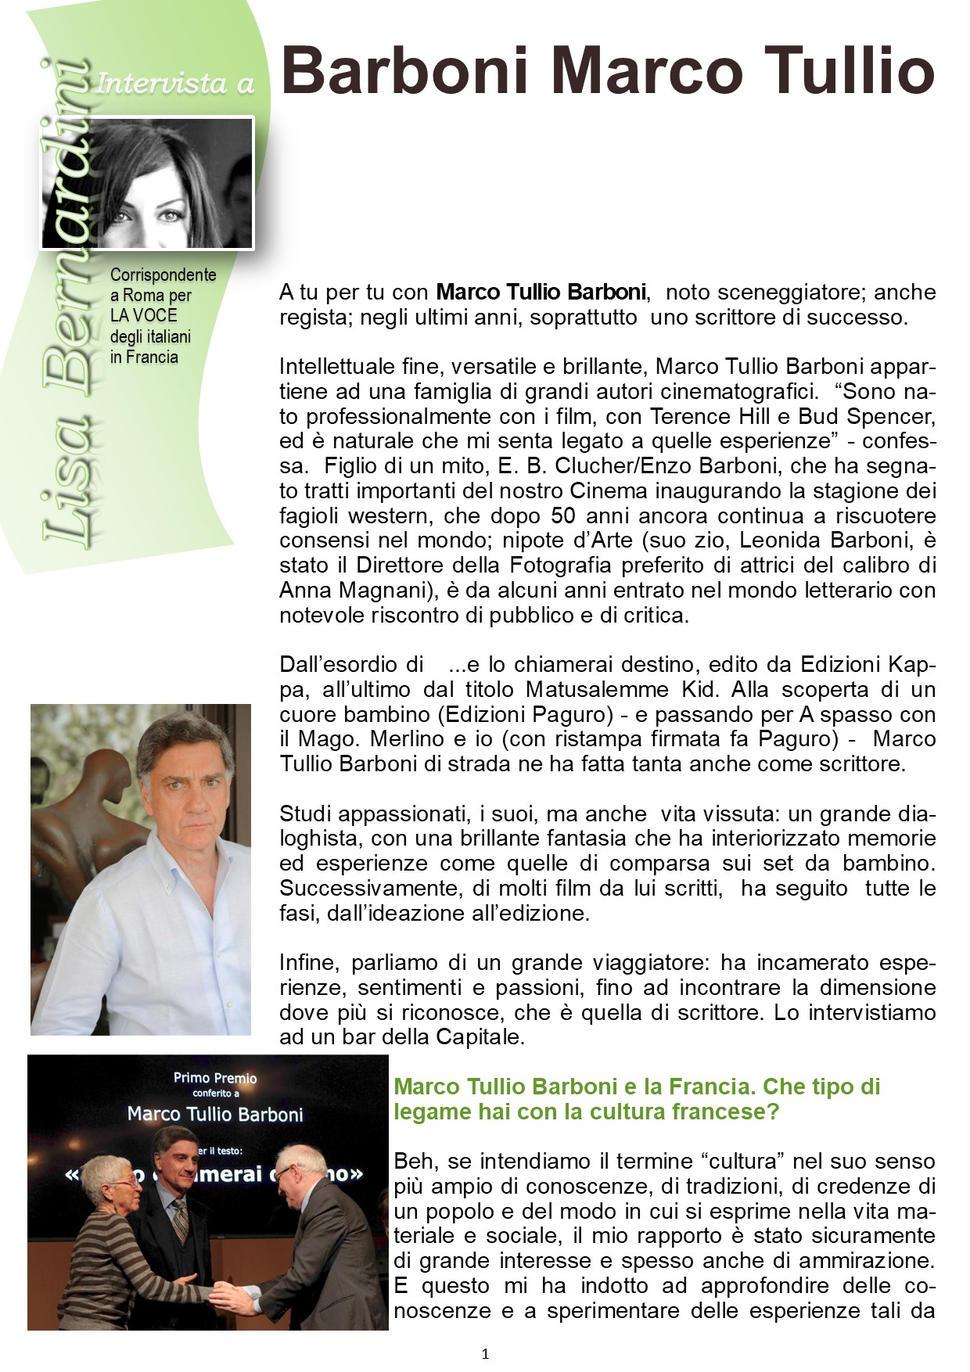 2 art Barboni 1Marco Tullio 13052021.jpg